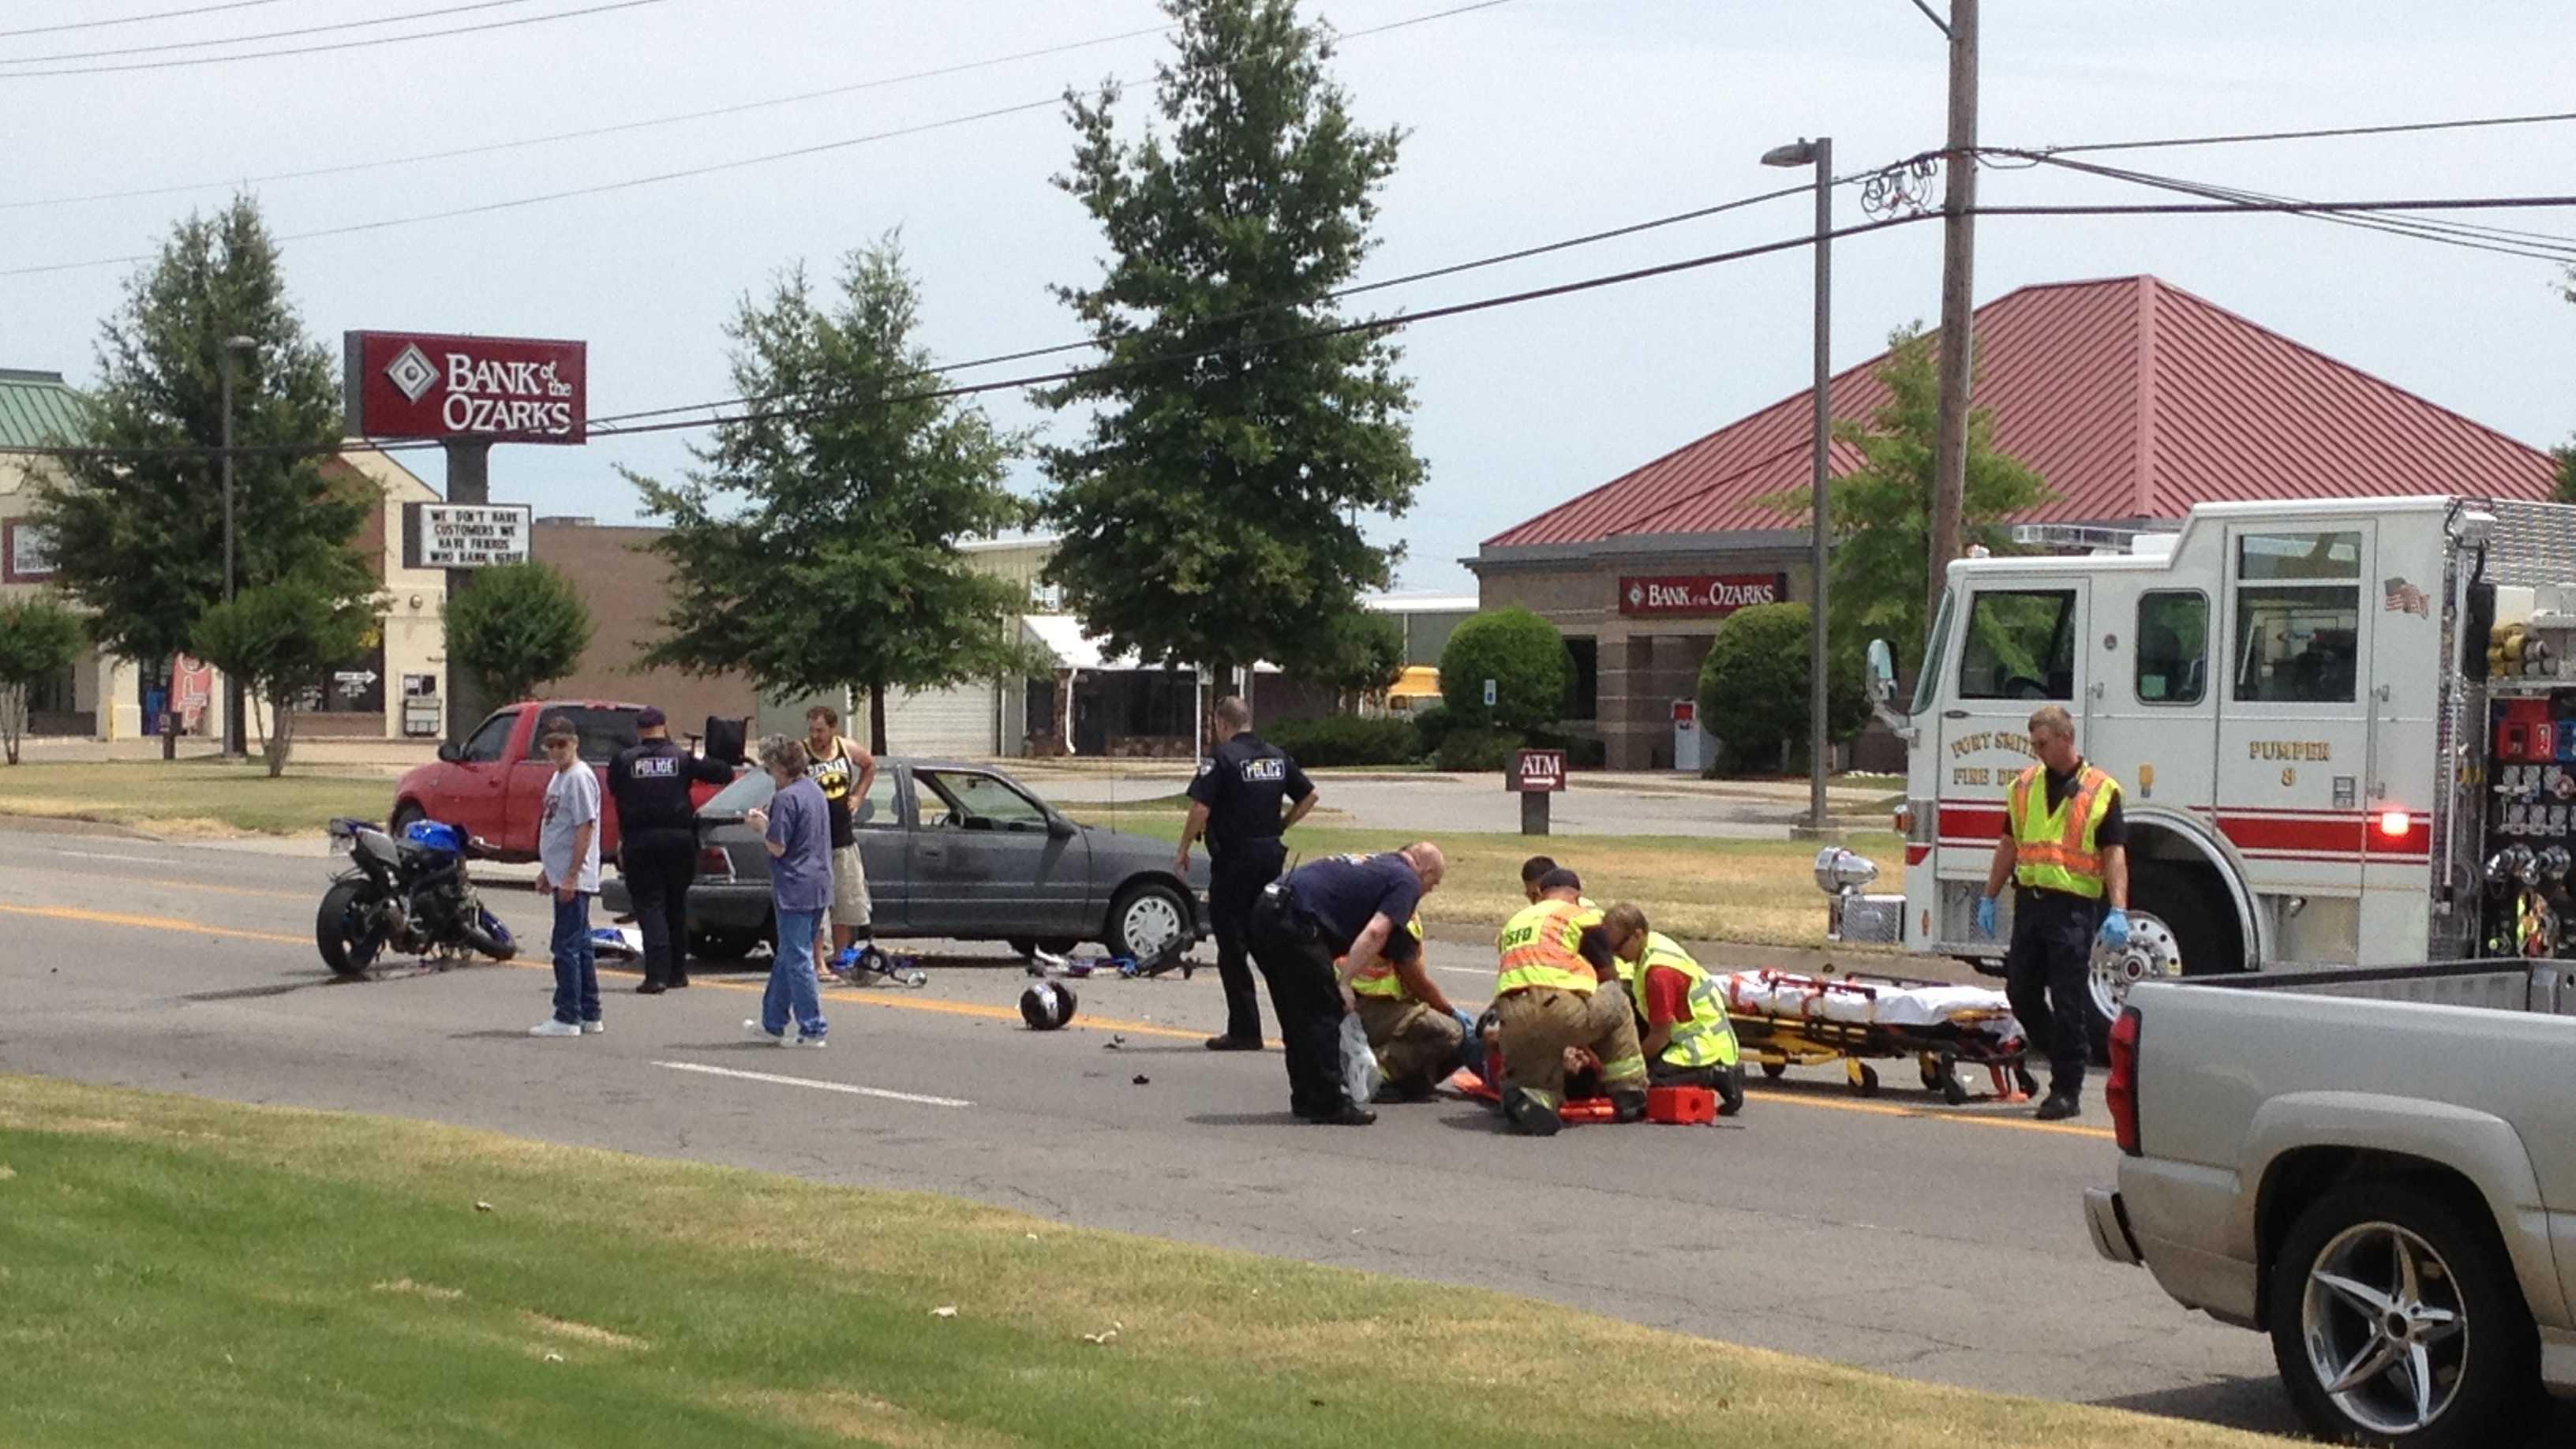 Motorcyclist treated after crash on Zero Street